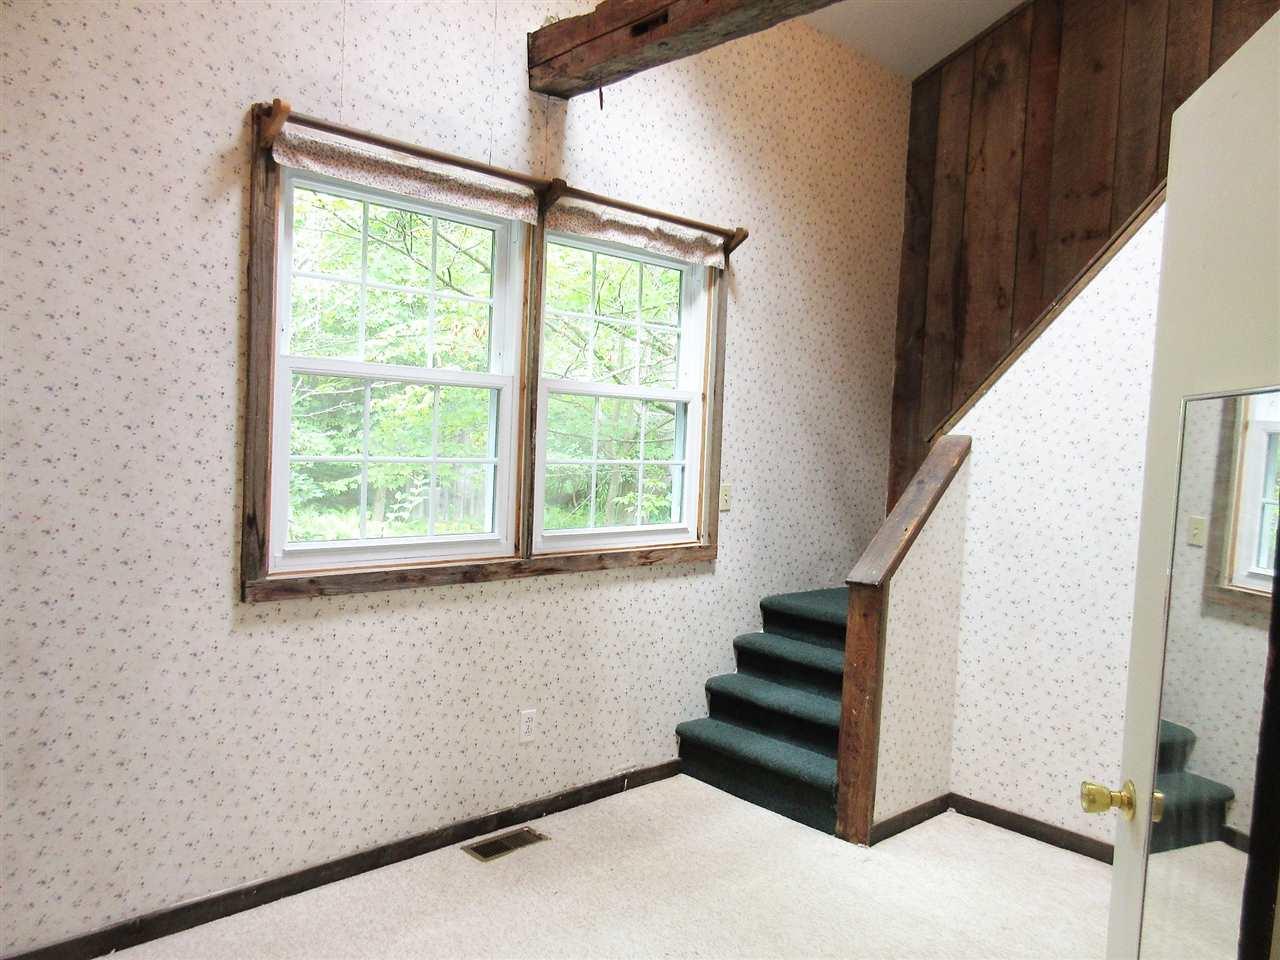 Mount-Snow-Real-Estate-4626264-25